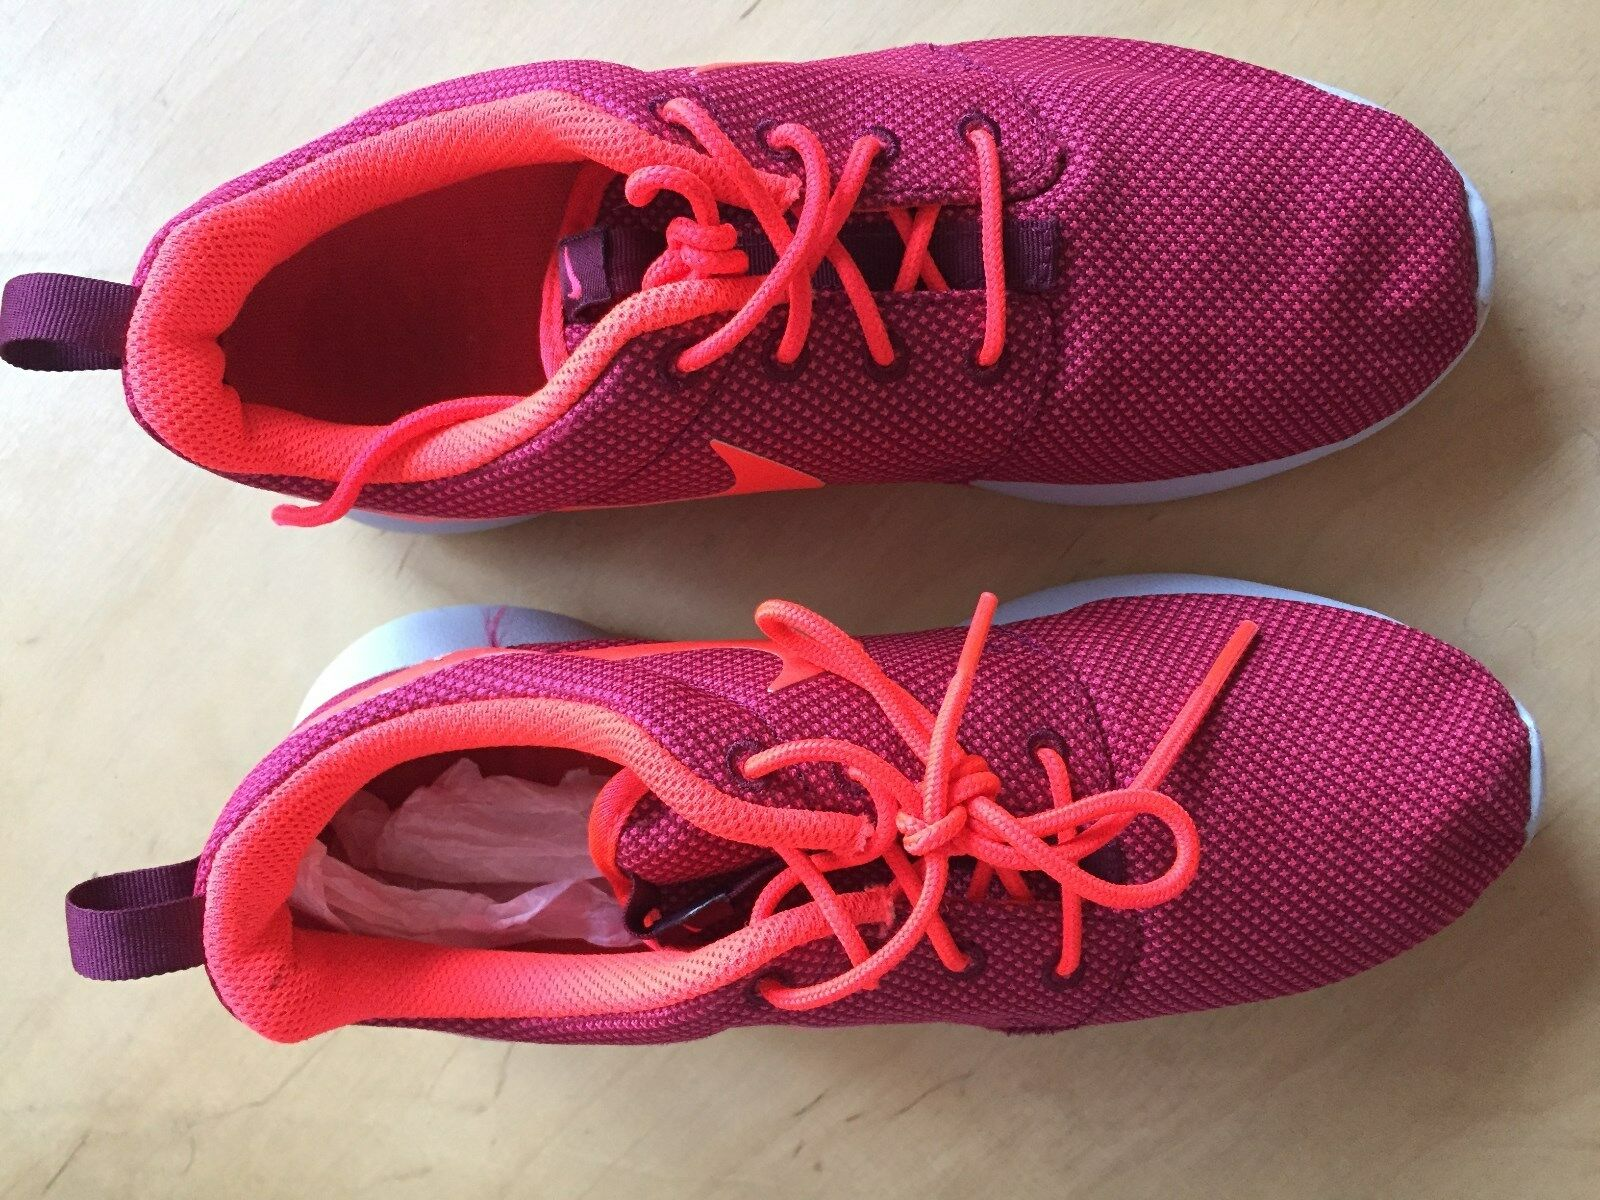 Nike Turnschuhe 38 Sneaker Roshe Run Gr. 38 Turnschuhe (UK 4,5) 3808af